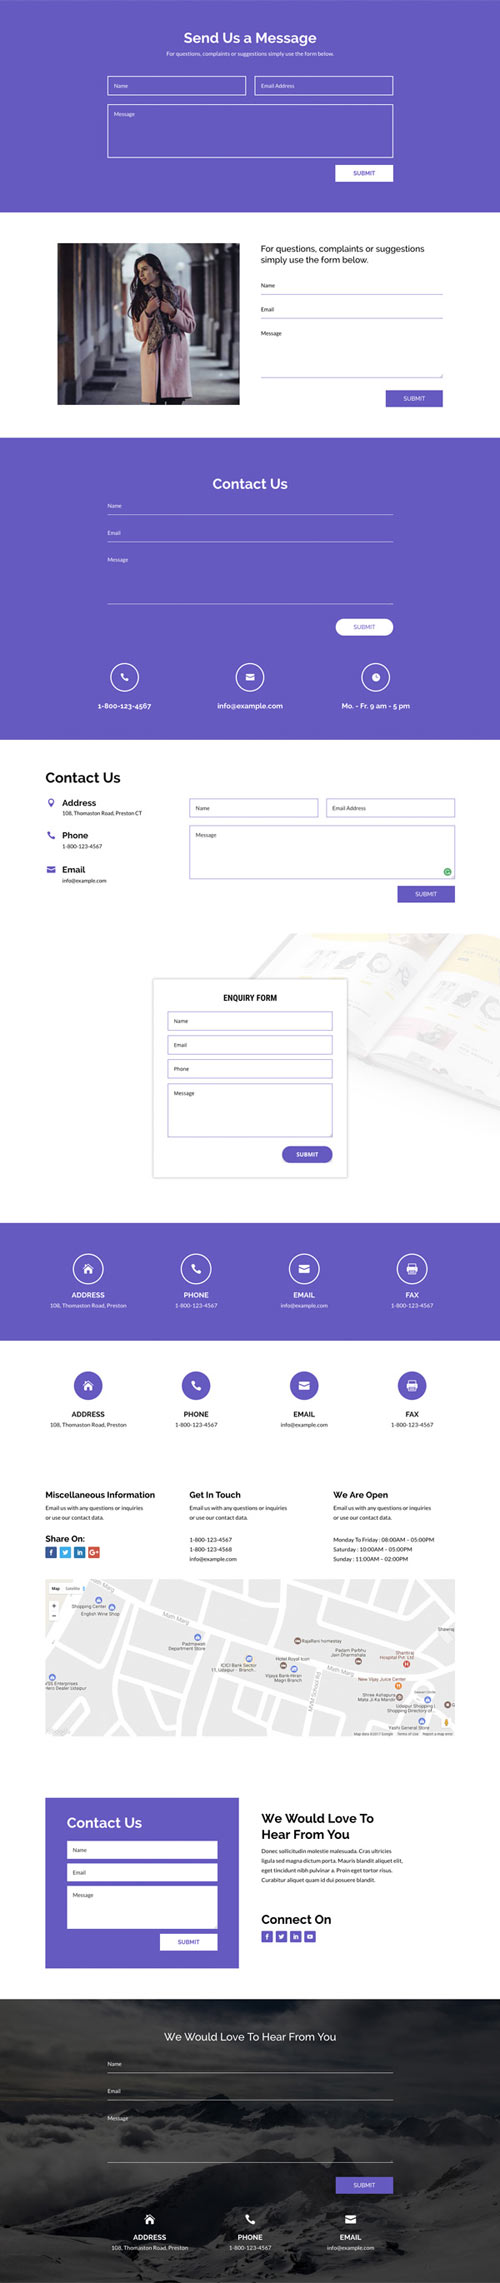 Divi contact form layouts